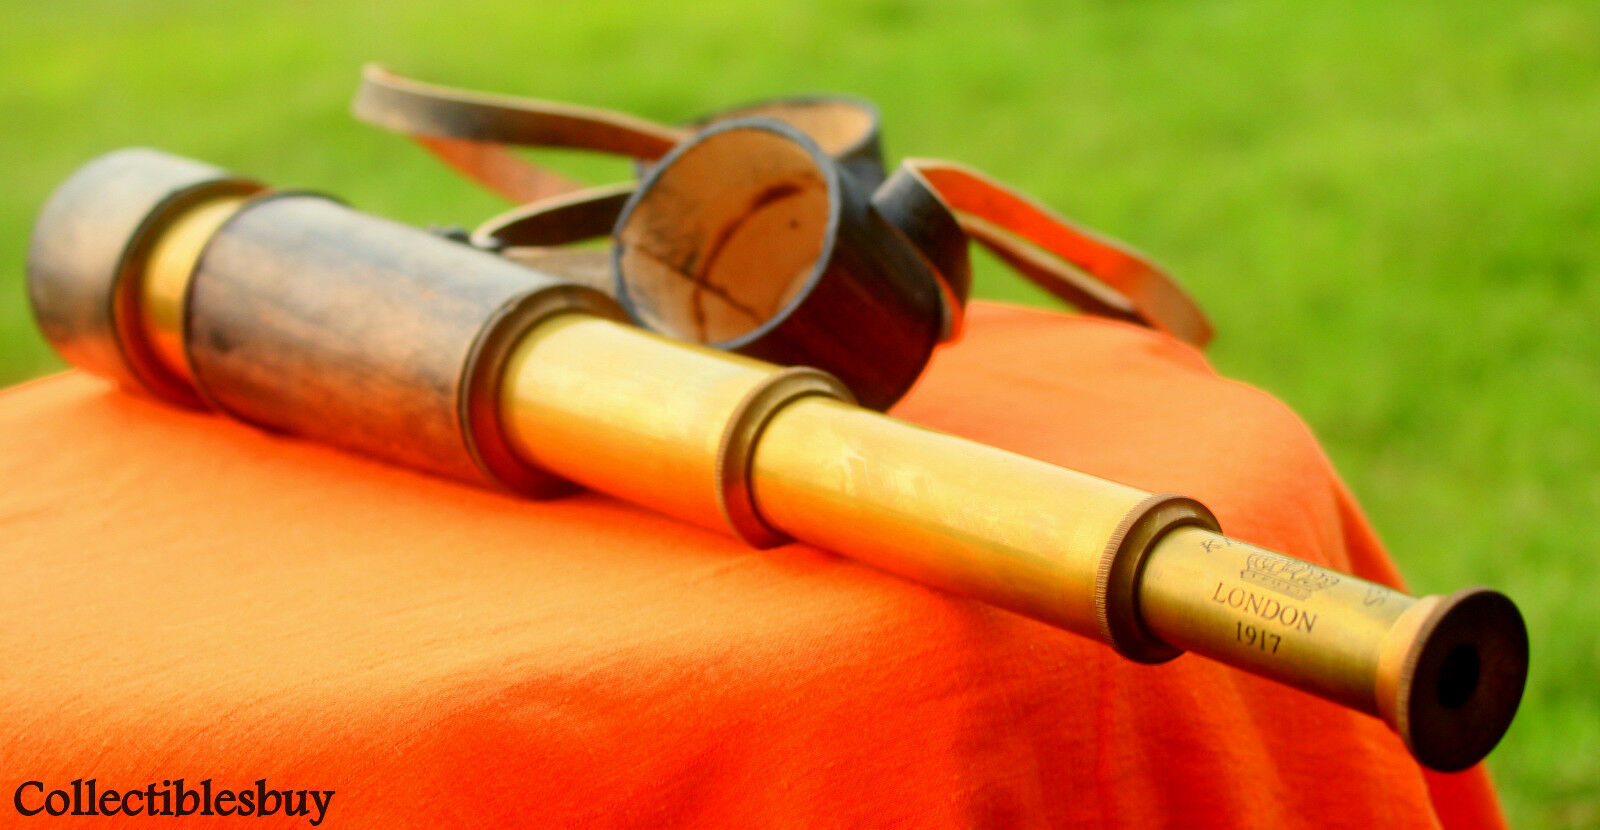 Maritime Brass Antique Telescope Leather Vintage Spyglass Lens Cap Hand Marine